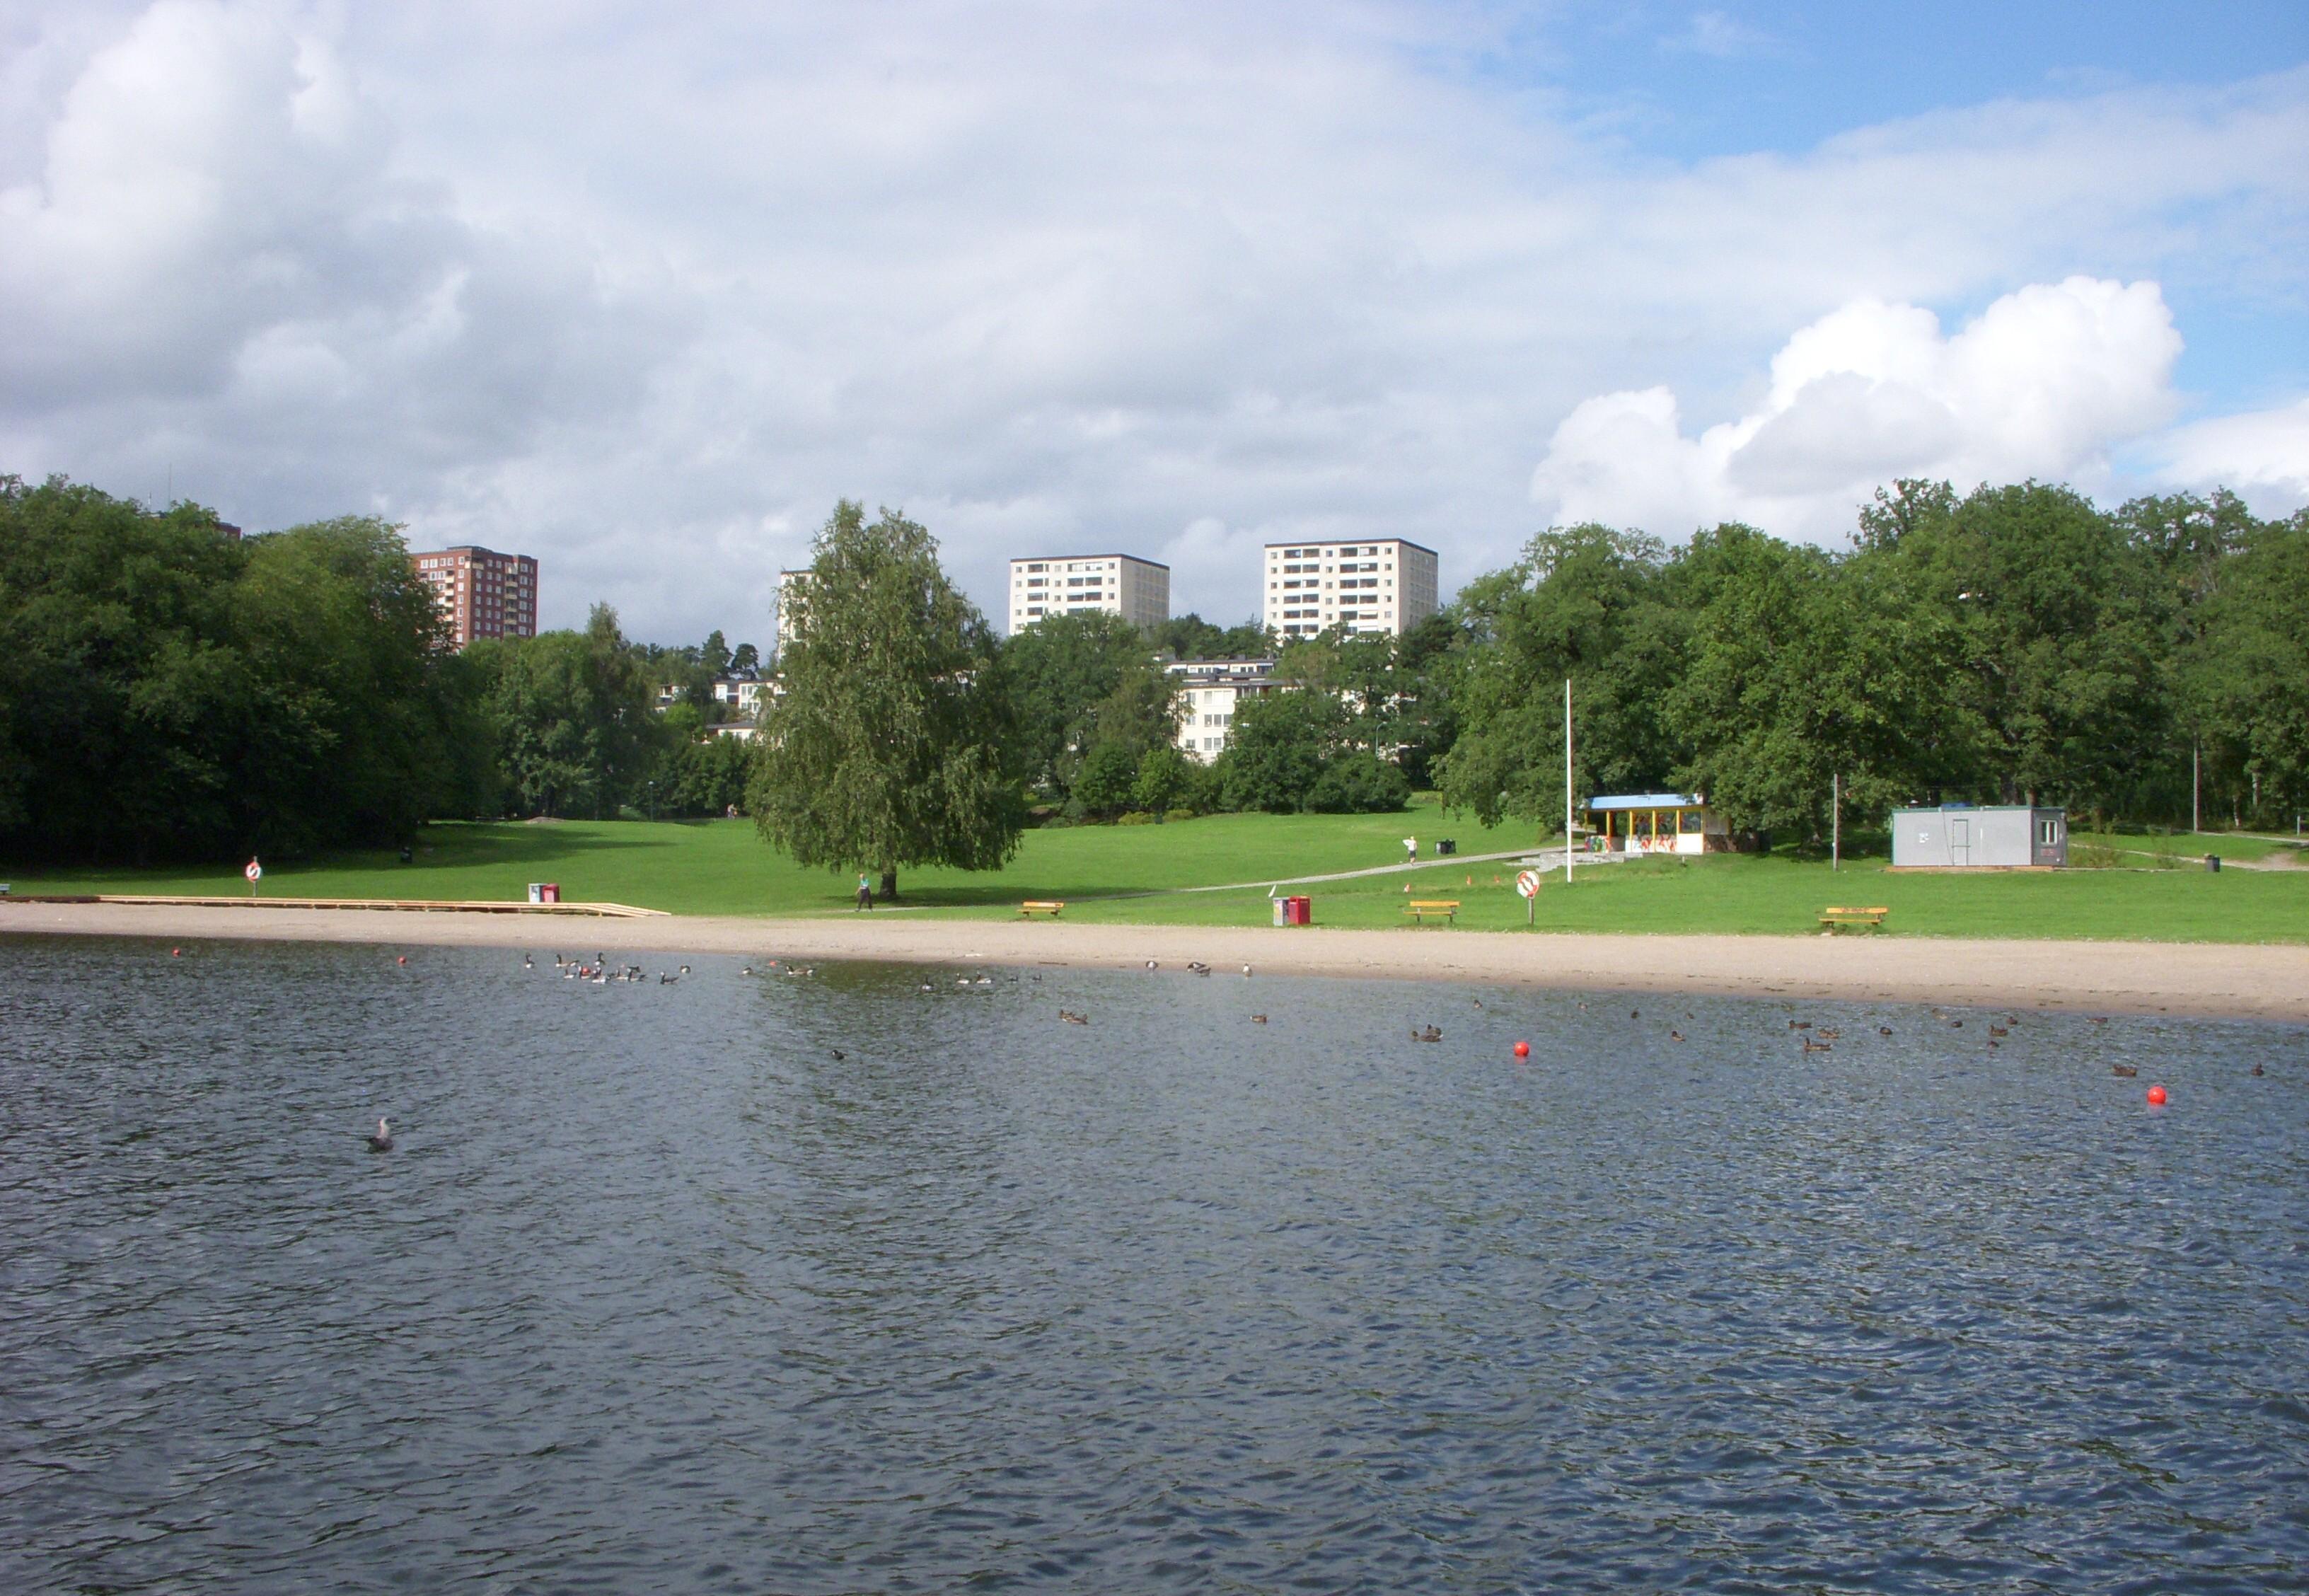 Nordiskt centrum pa hasselby slott hotat